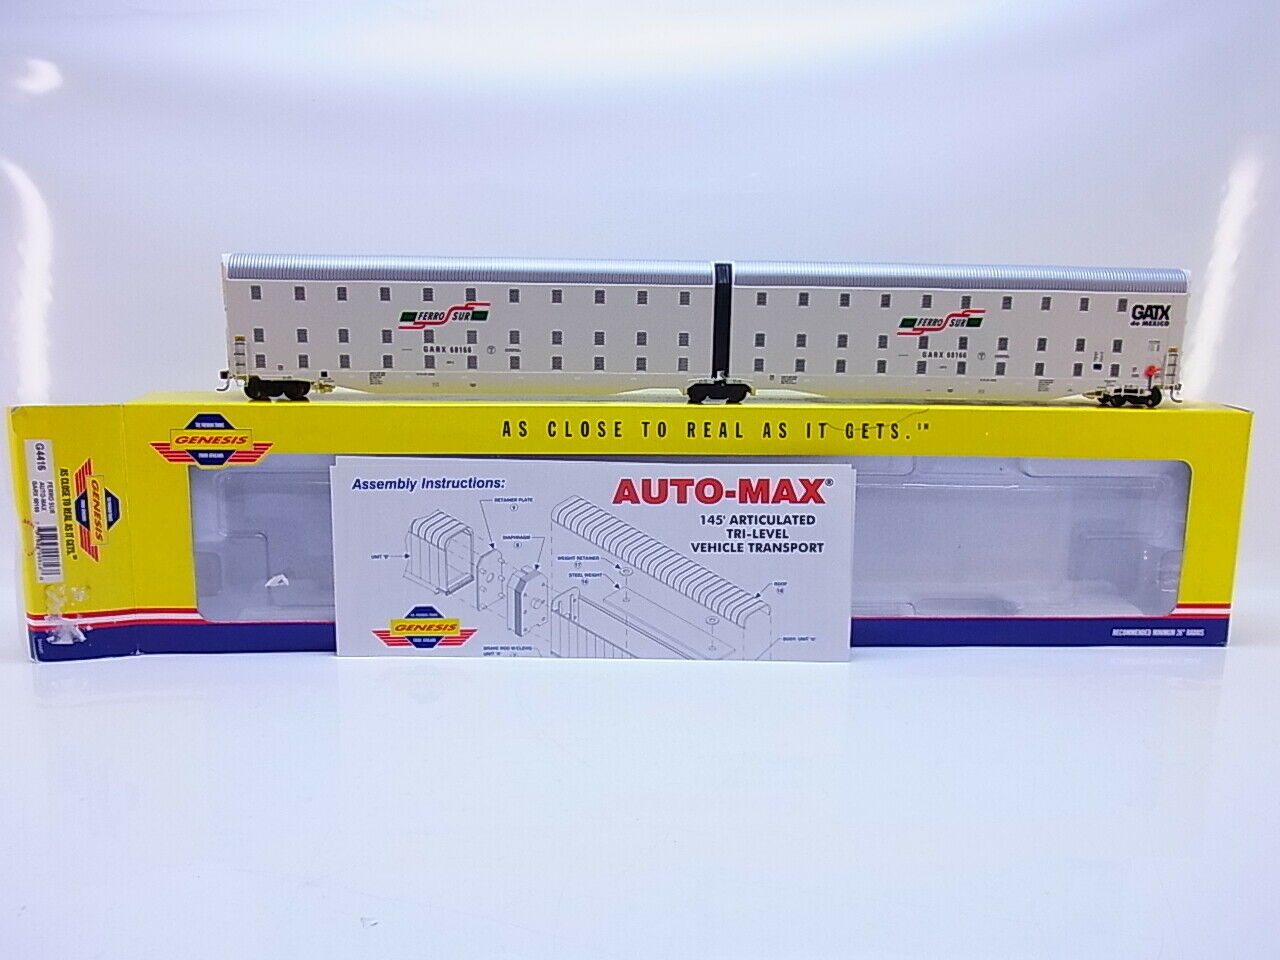 55177  Neuwertiger Athearn Genesis H0 G4416 US Ferro sor Car-Max Garx 68166 OVP